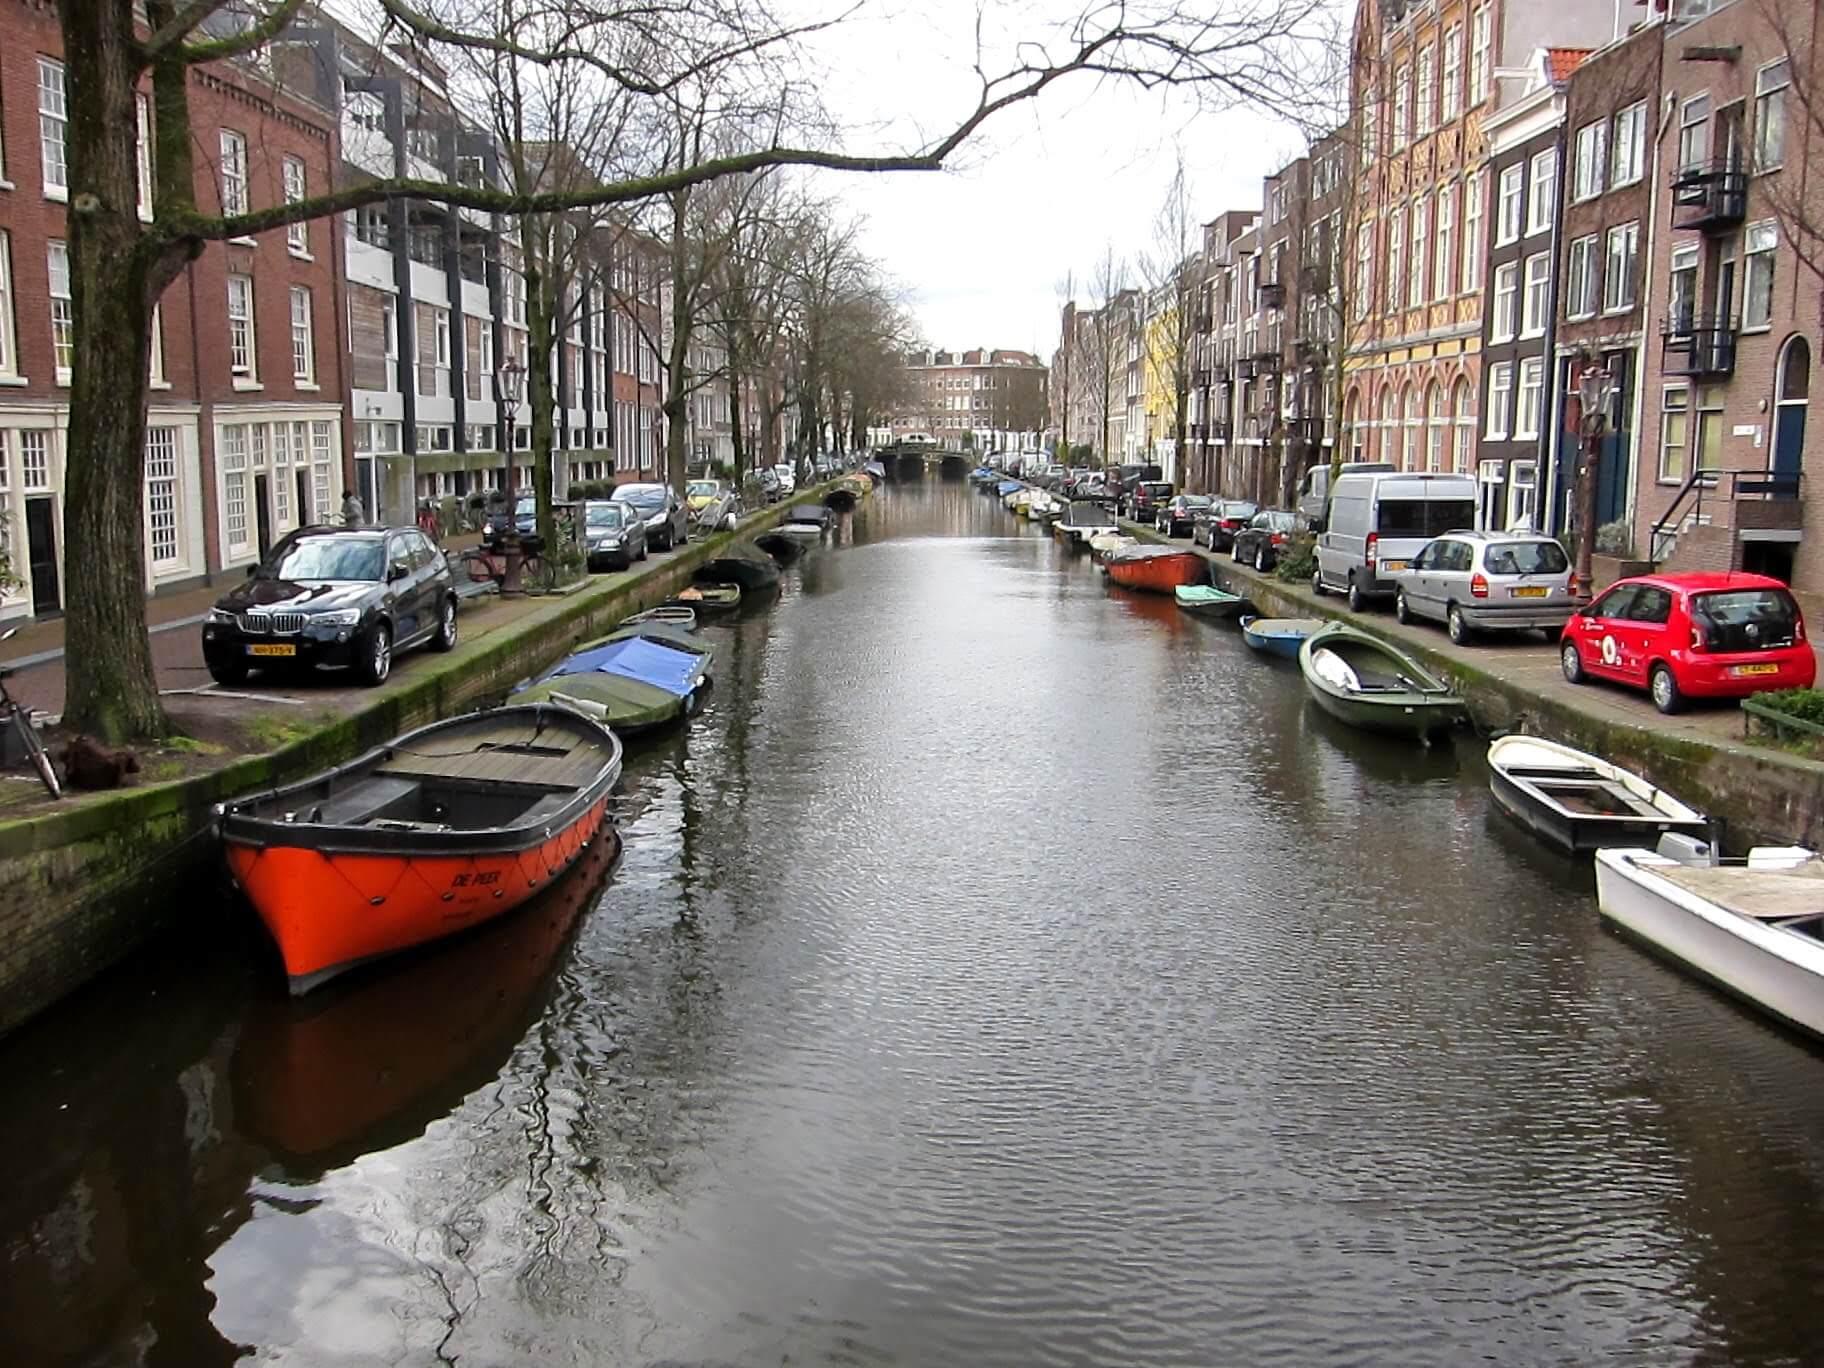 boats-along-canal.jpg